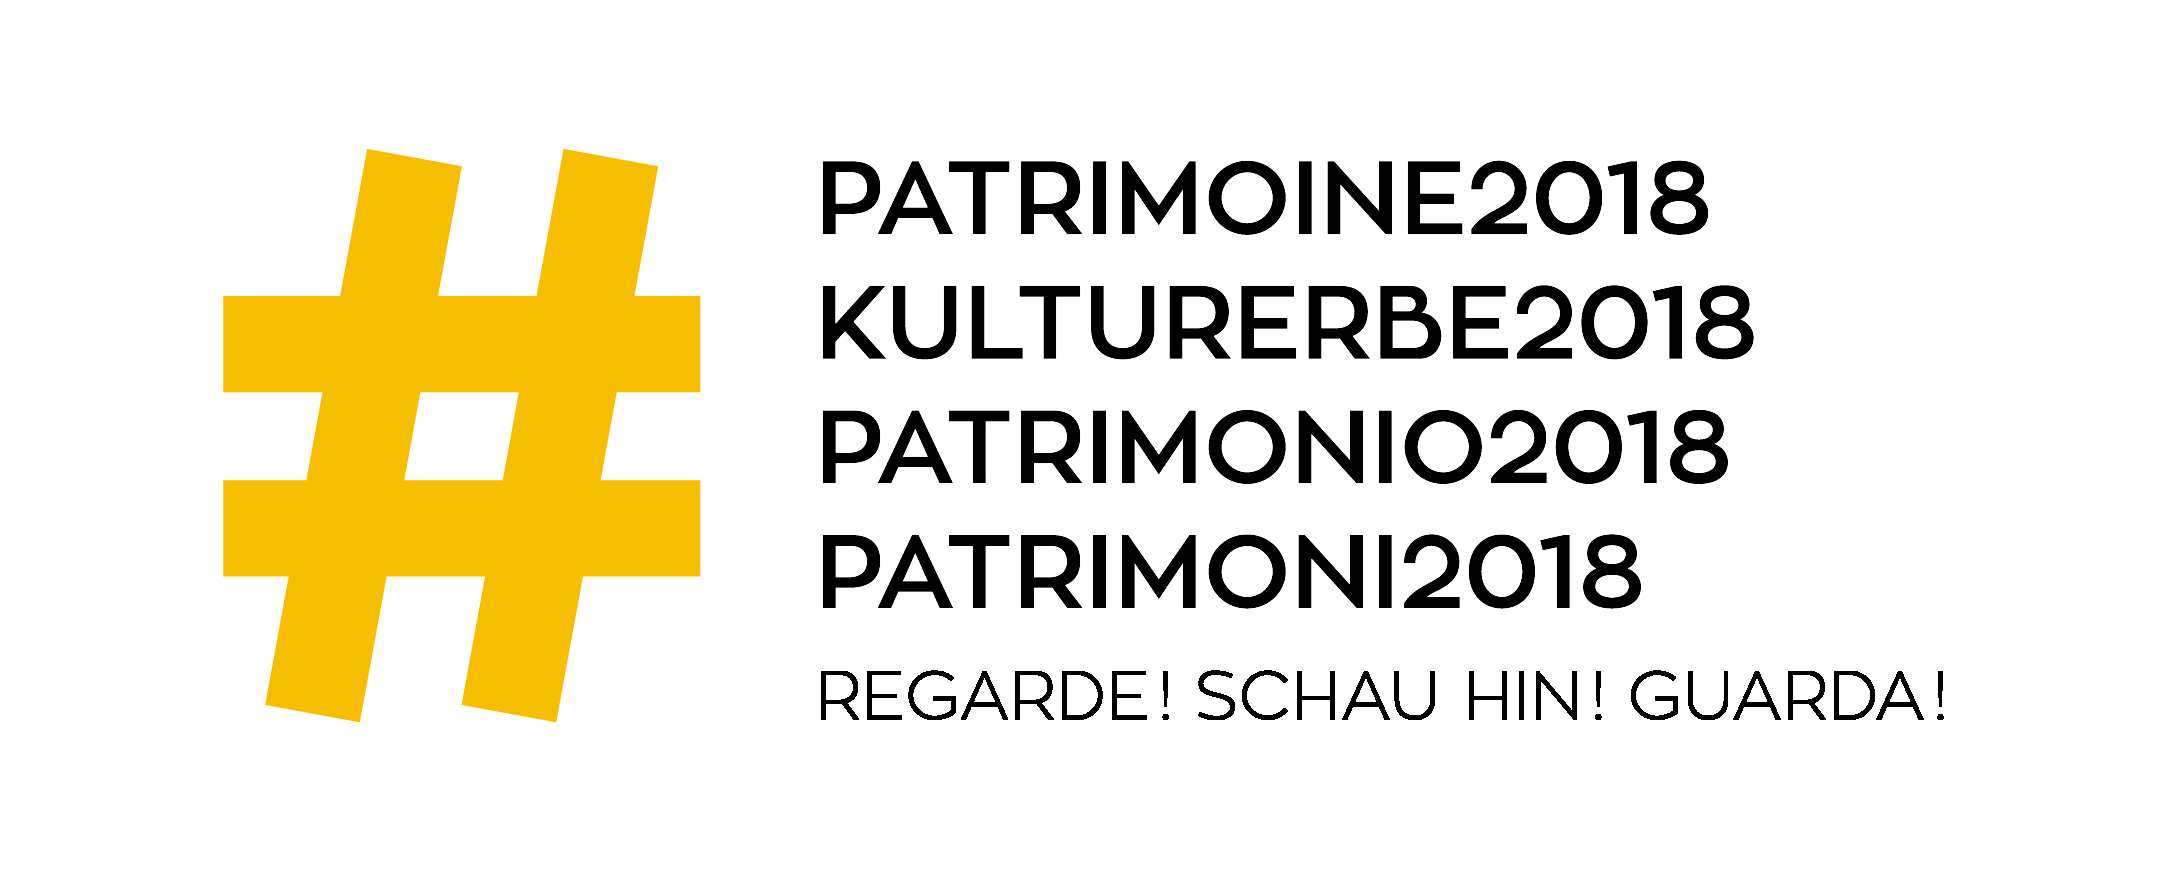 Patrimoine logo slogan rgb jaune